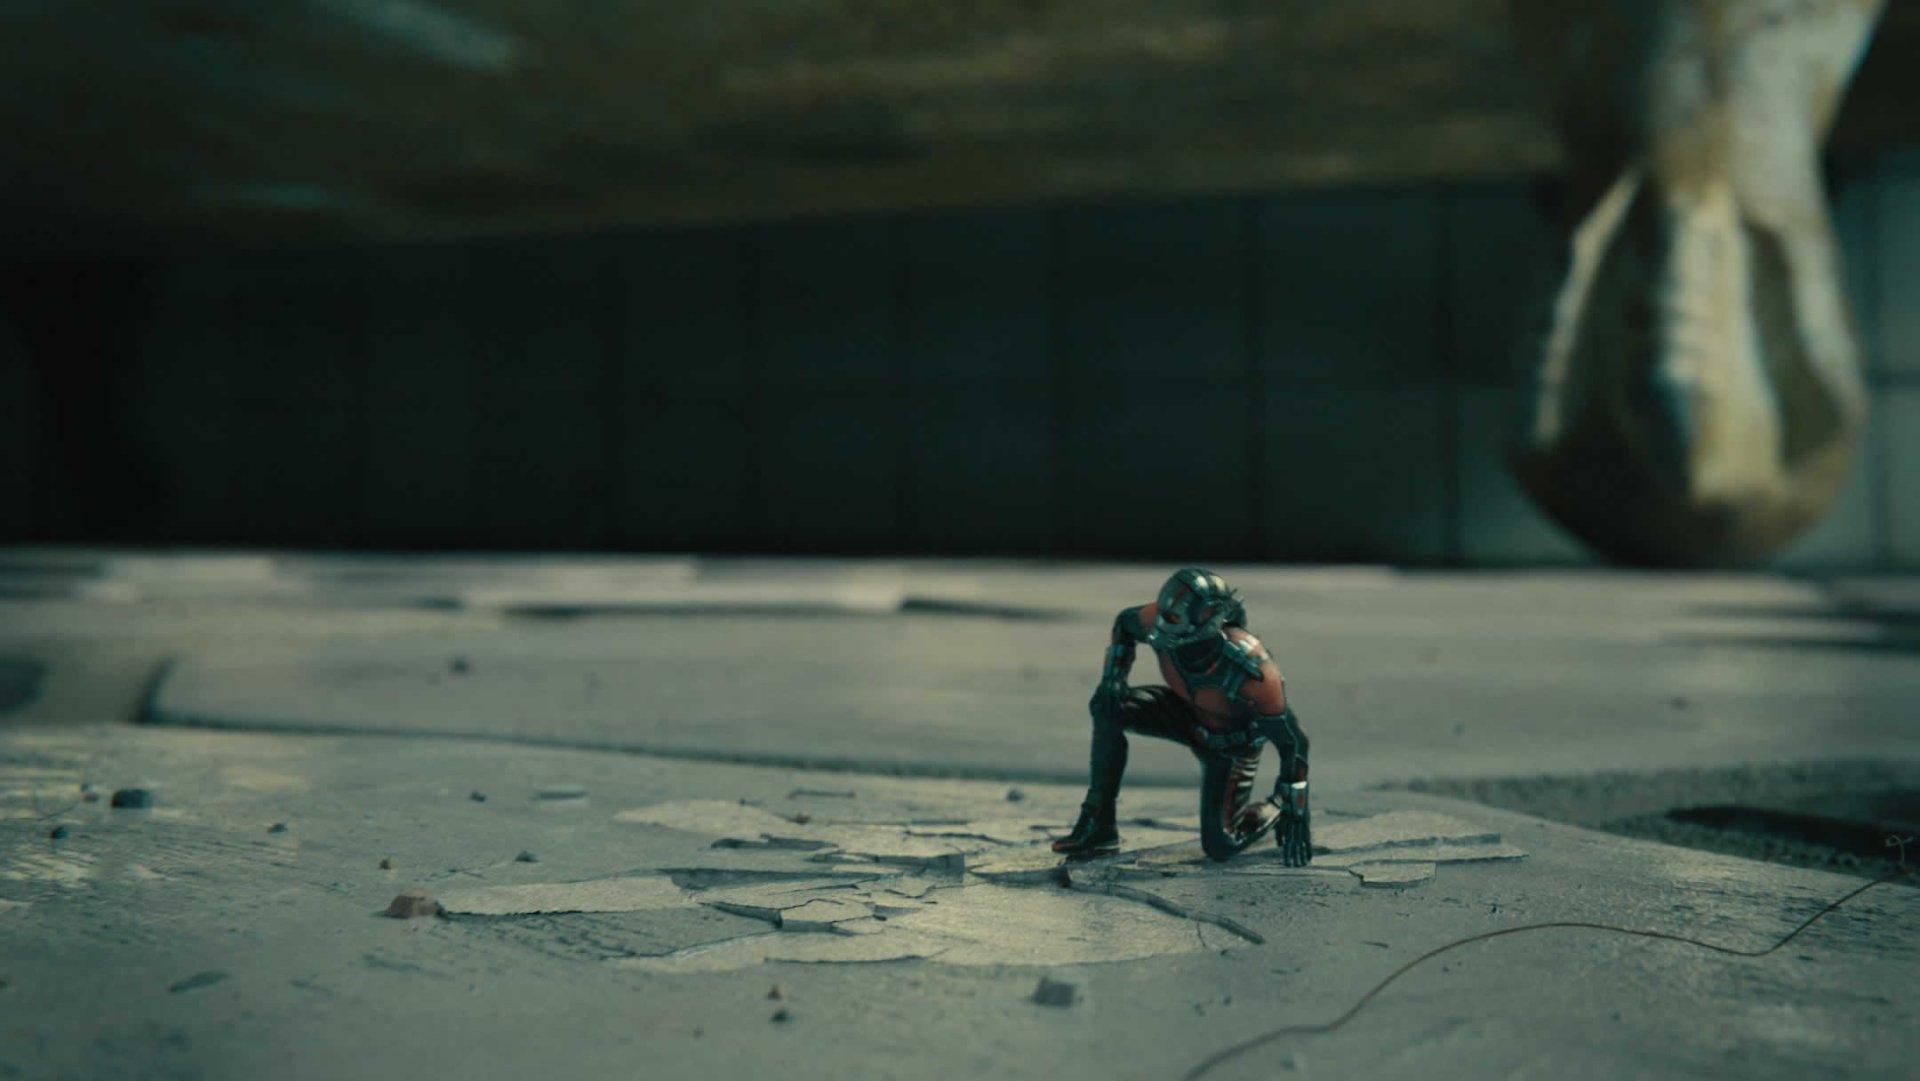 Ant Man Retina Movie Wallpaper: Ant-Man HD Wallpaper